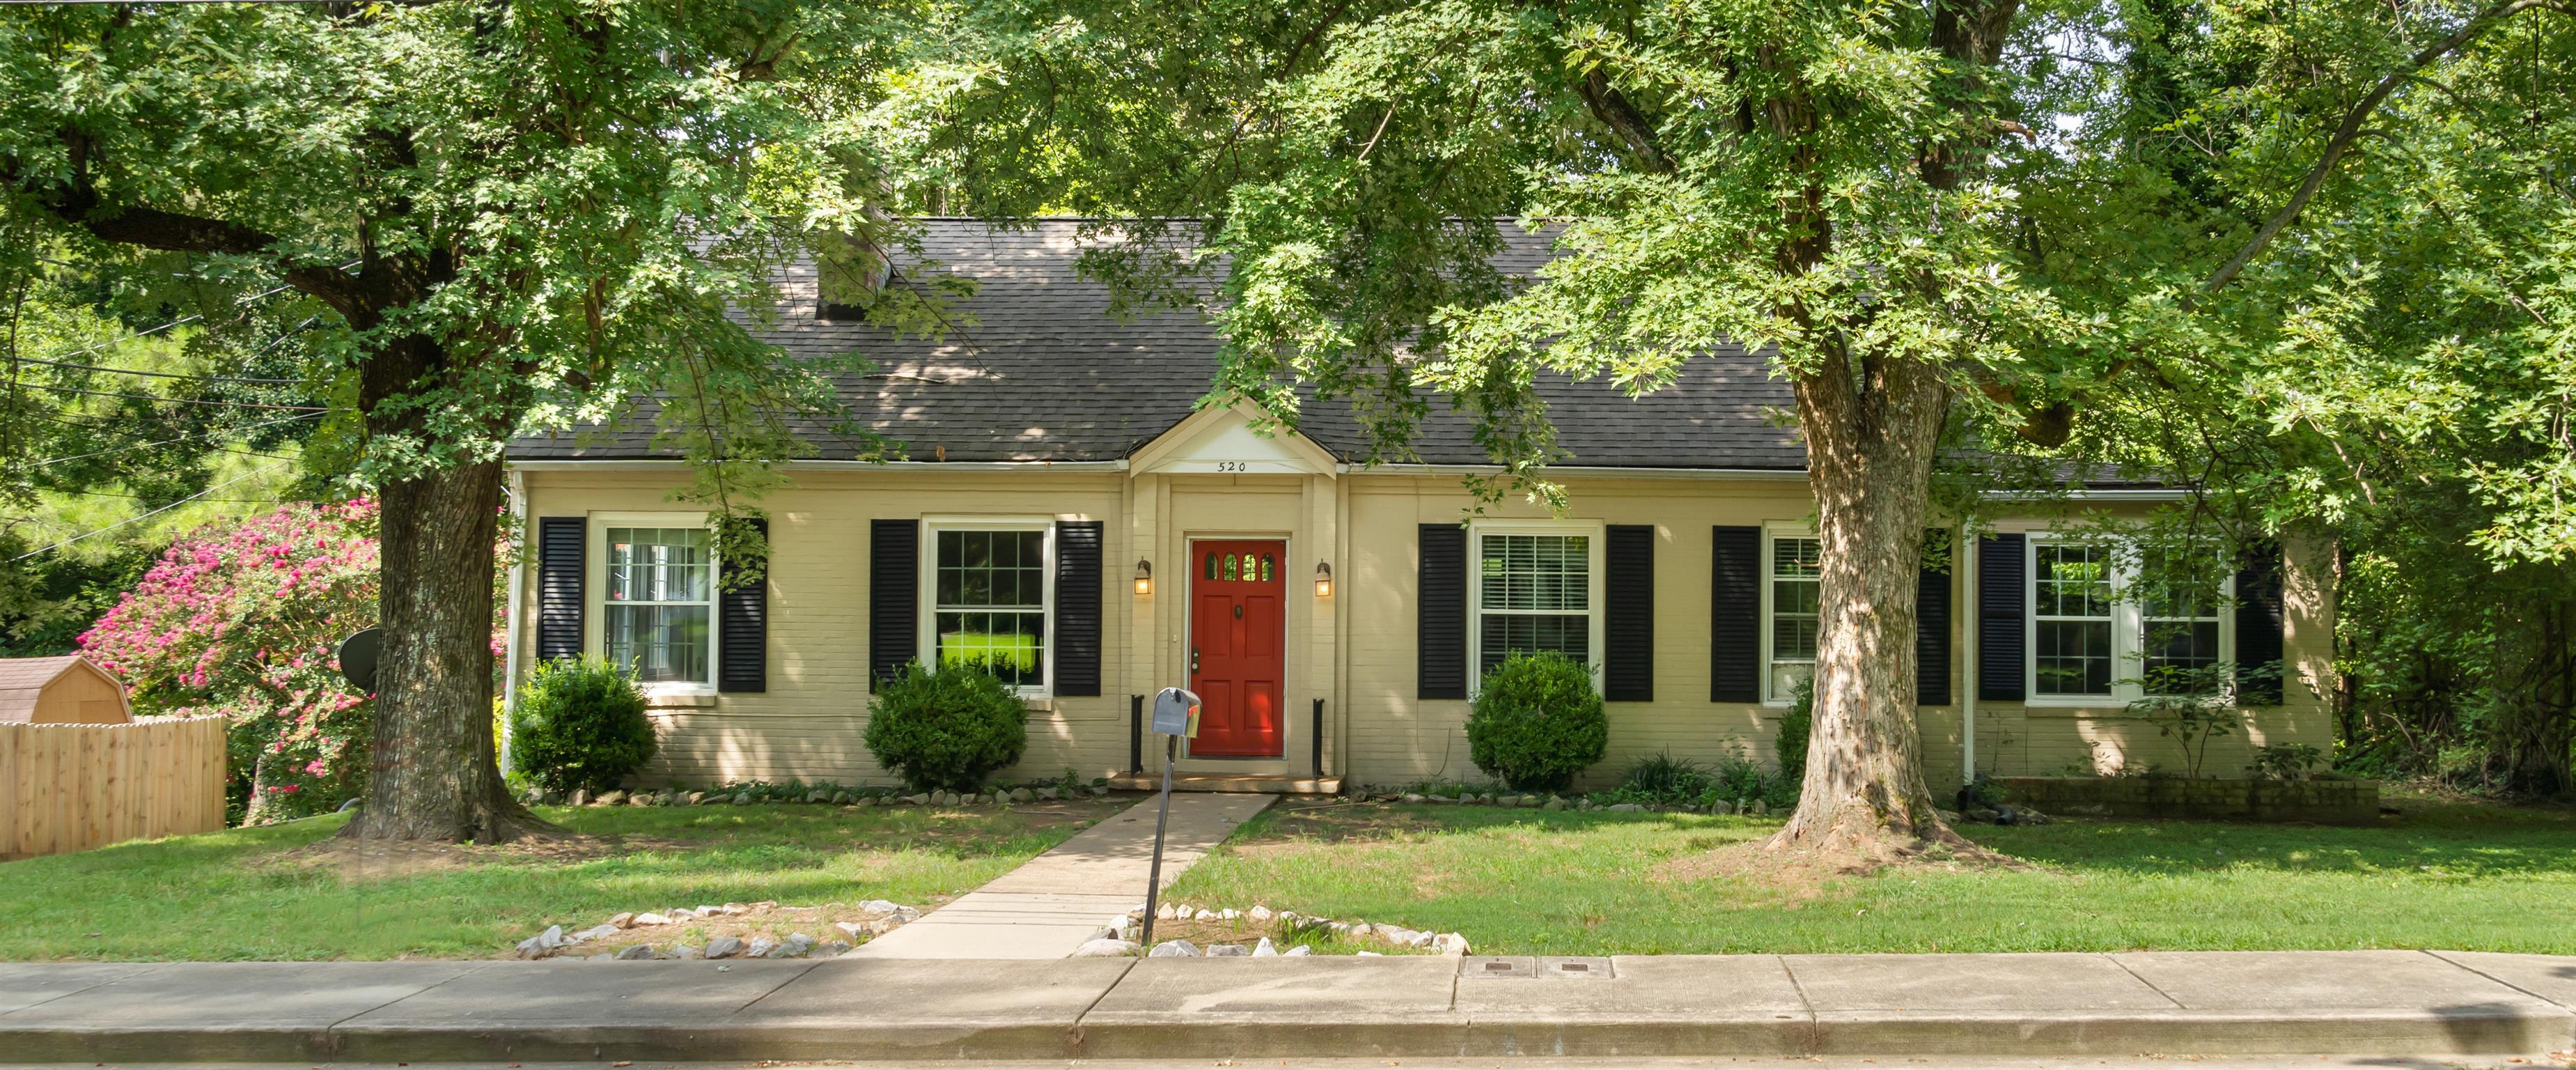 520 York St, Clarksville, TN 37040 - Clarksville, TN real estate listing